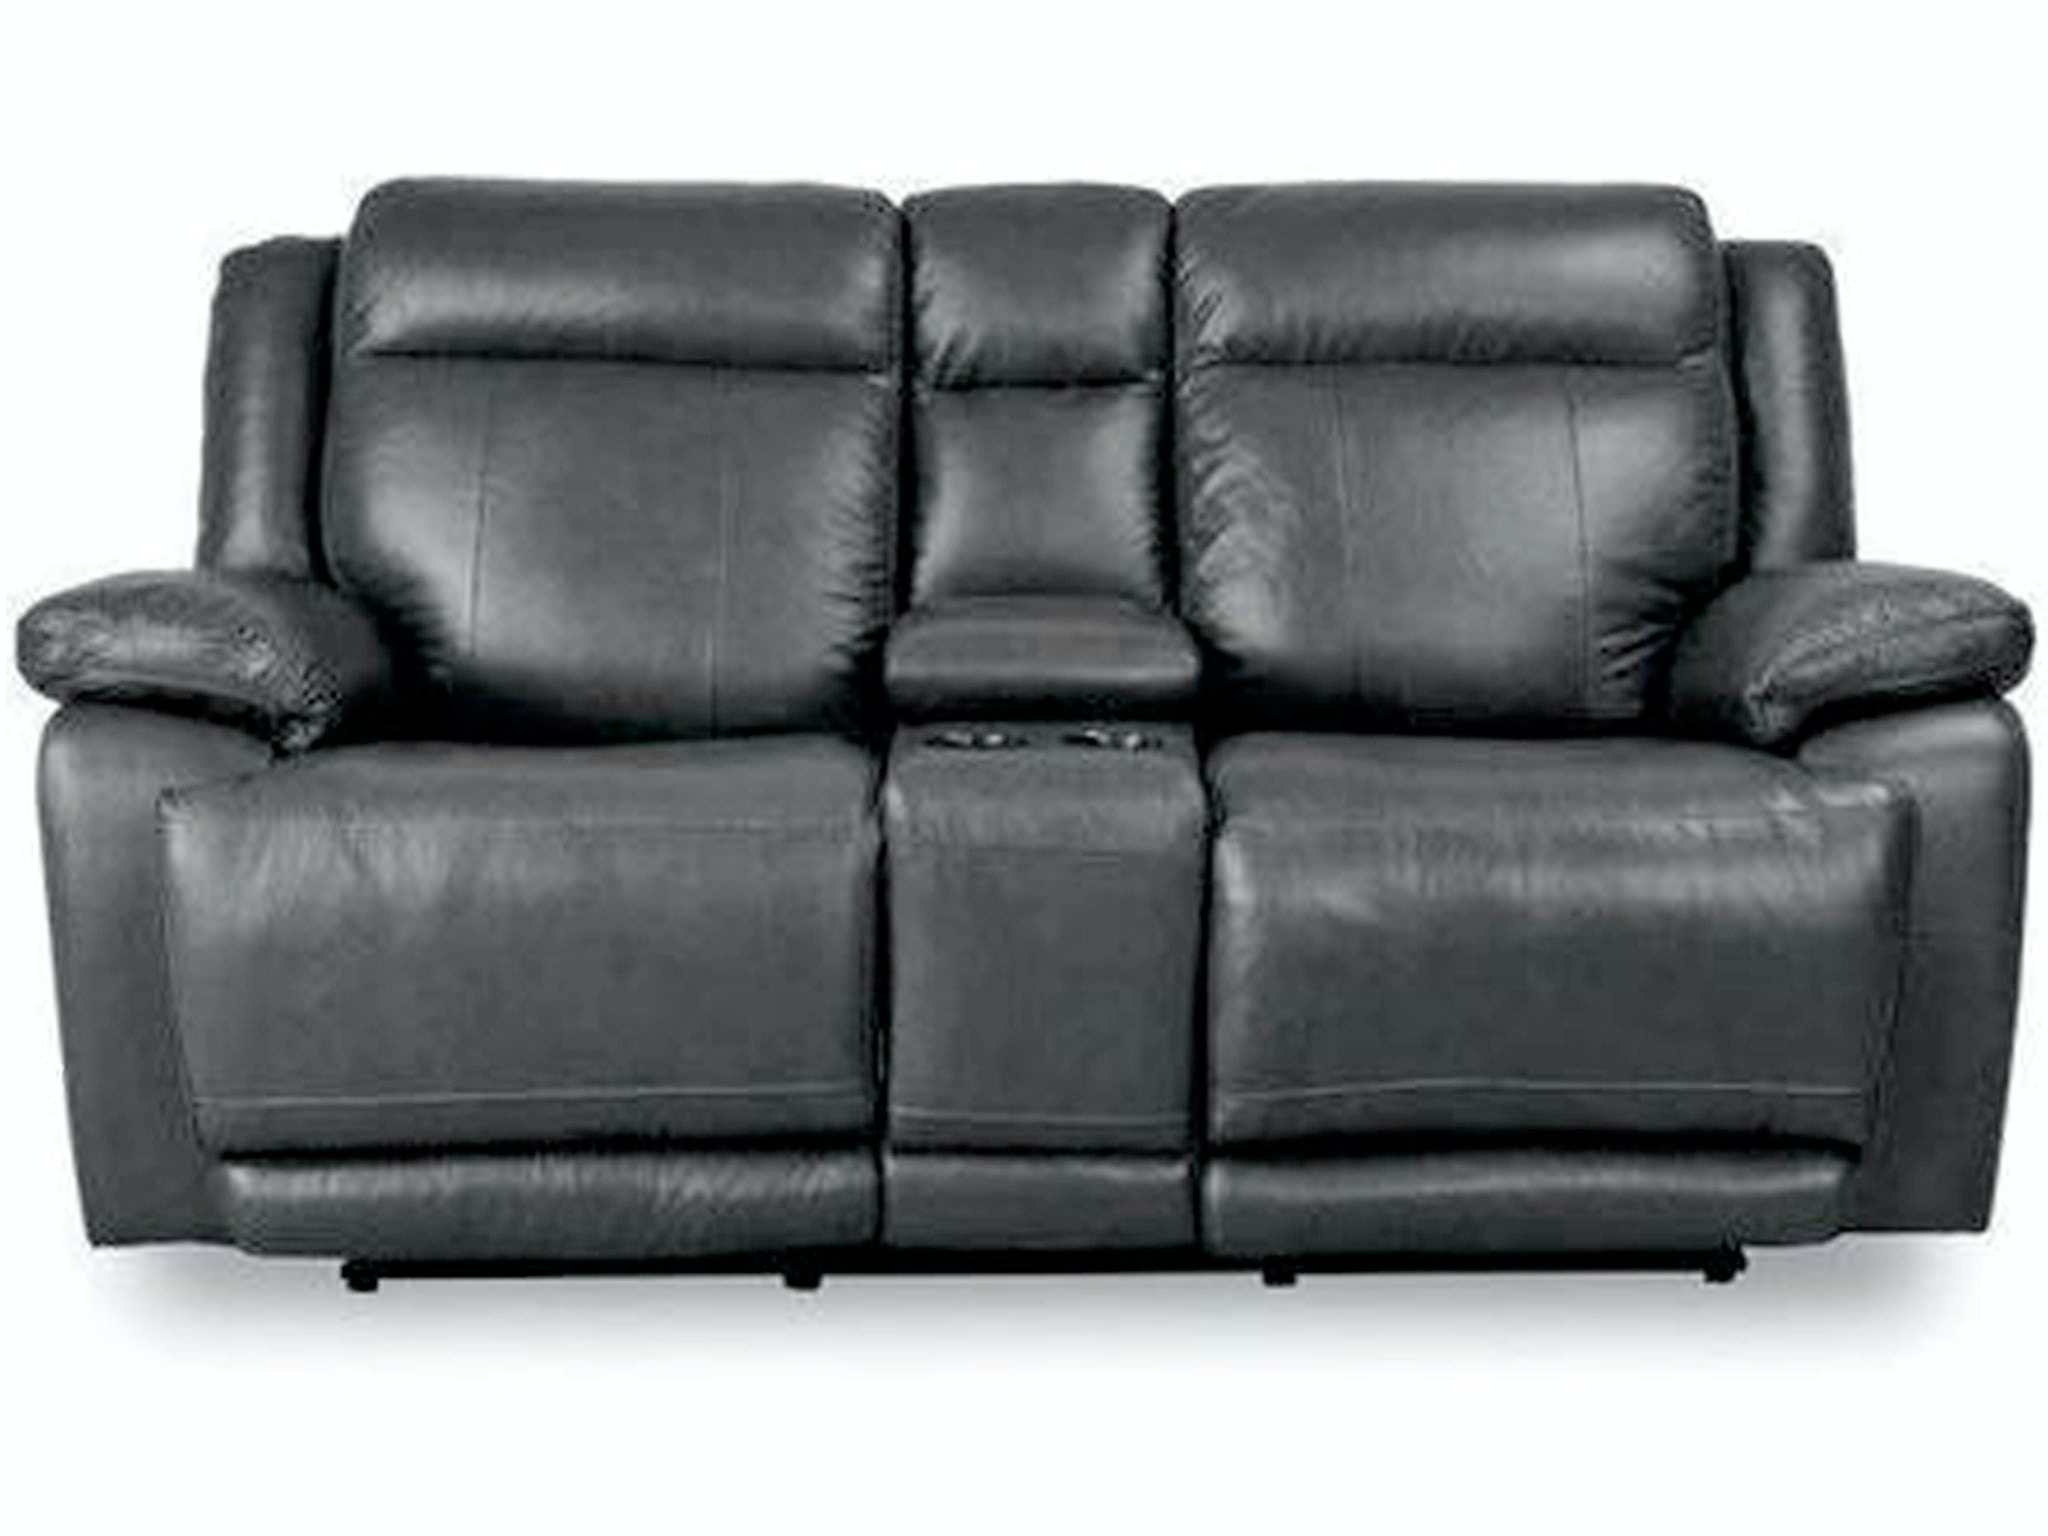 bassett living room loveseat w  power   console 3706 pc42g